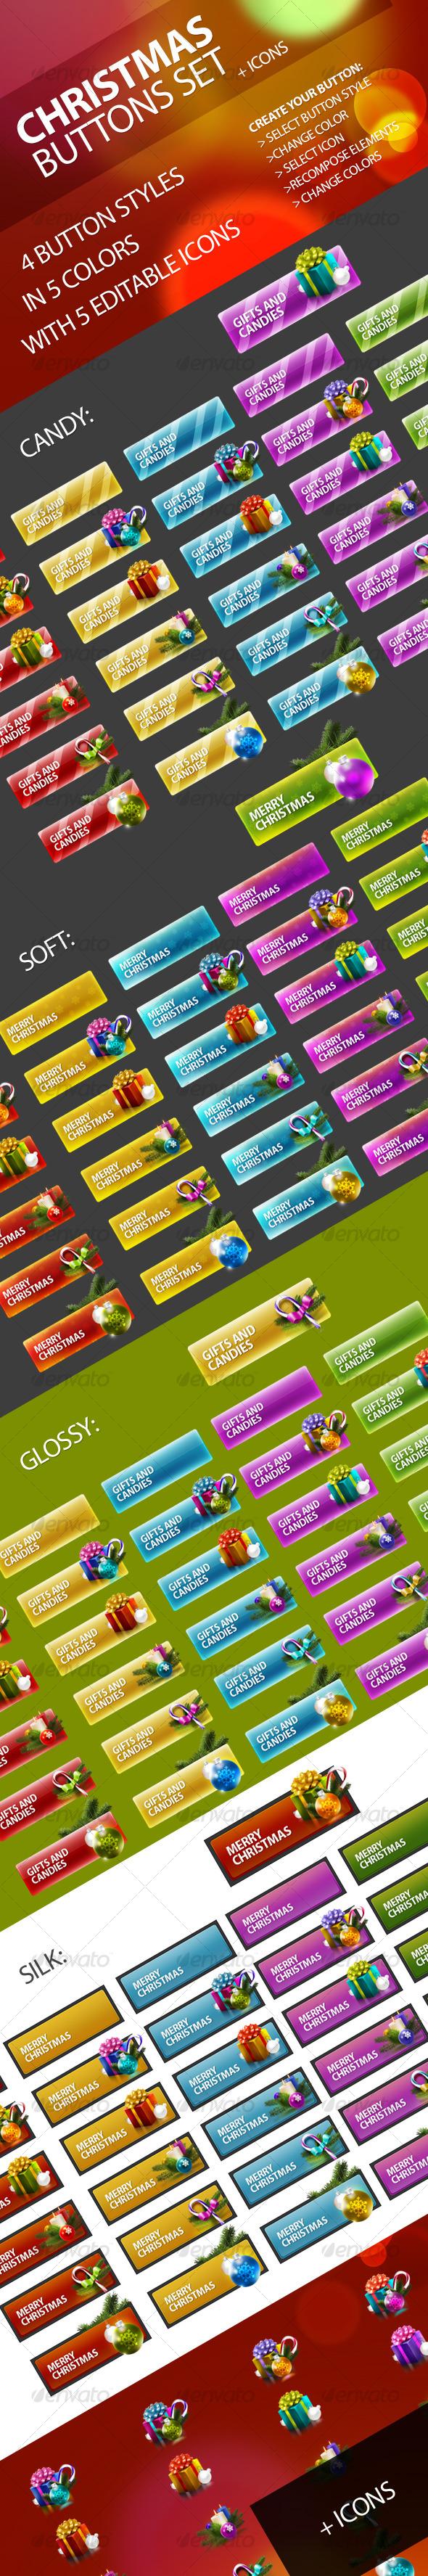 Christmas Buttons Set - Buttons Web Elements